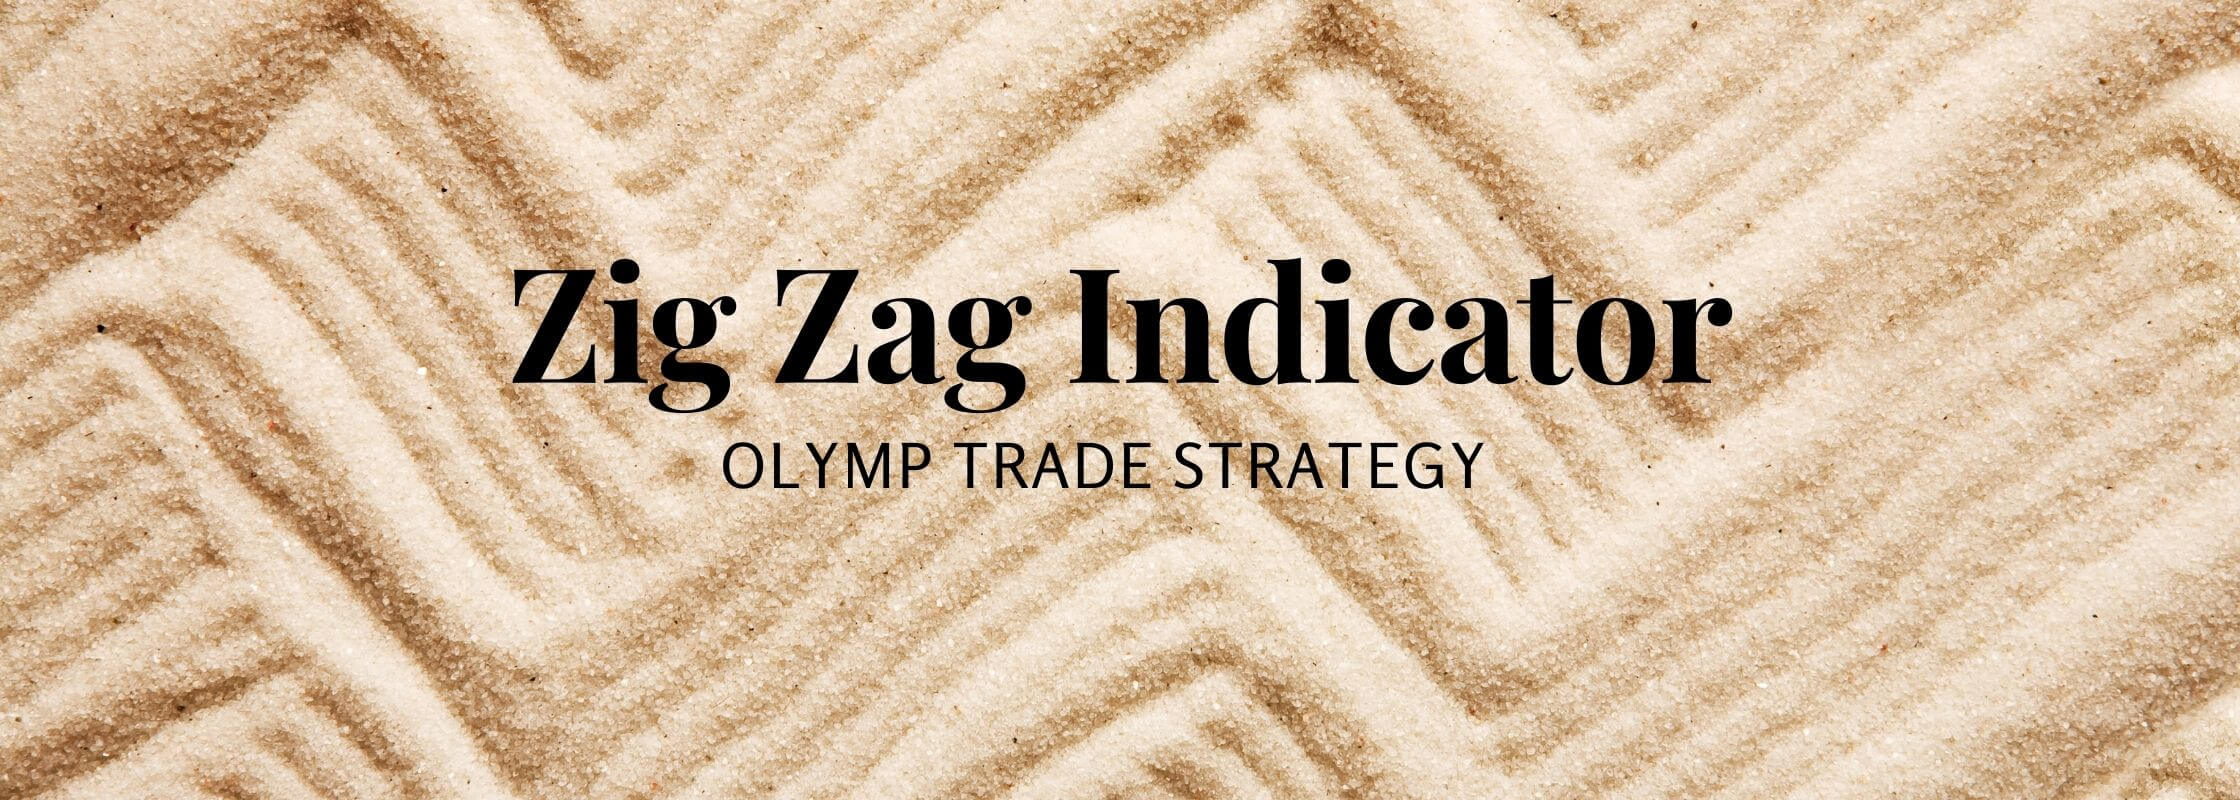 Zig Zag Indicator Olymp Trade